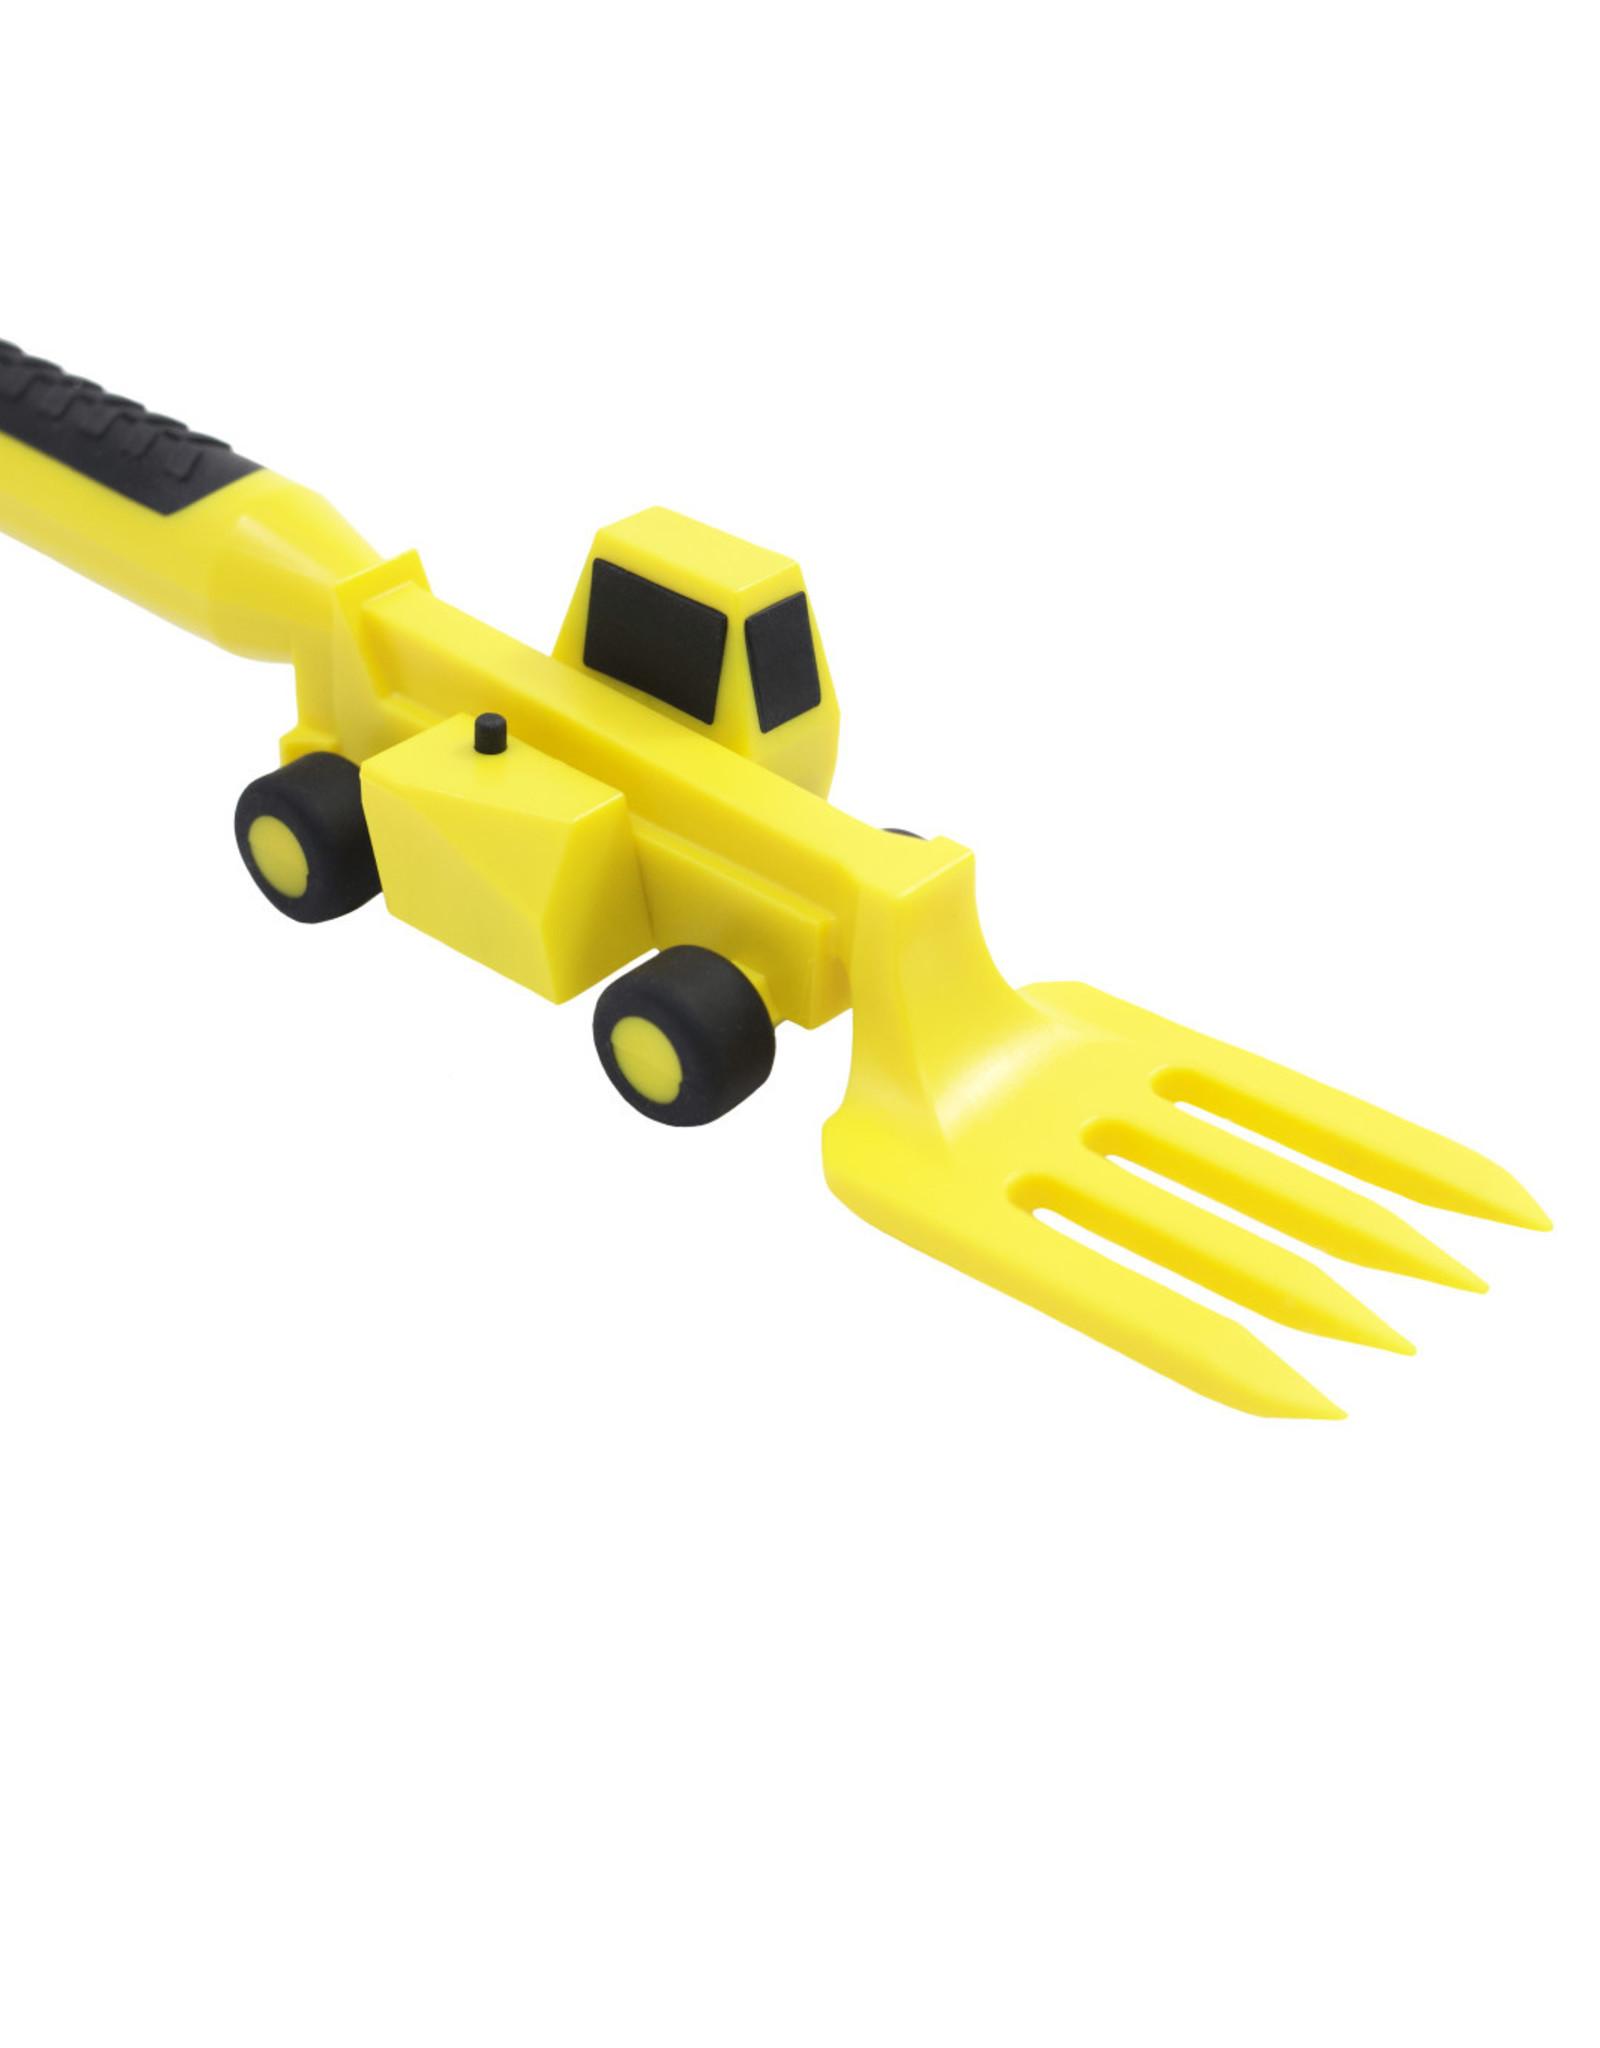 Constructive Eating Constructive Eating:  Fork Lift Fork